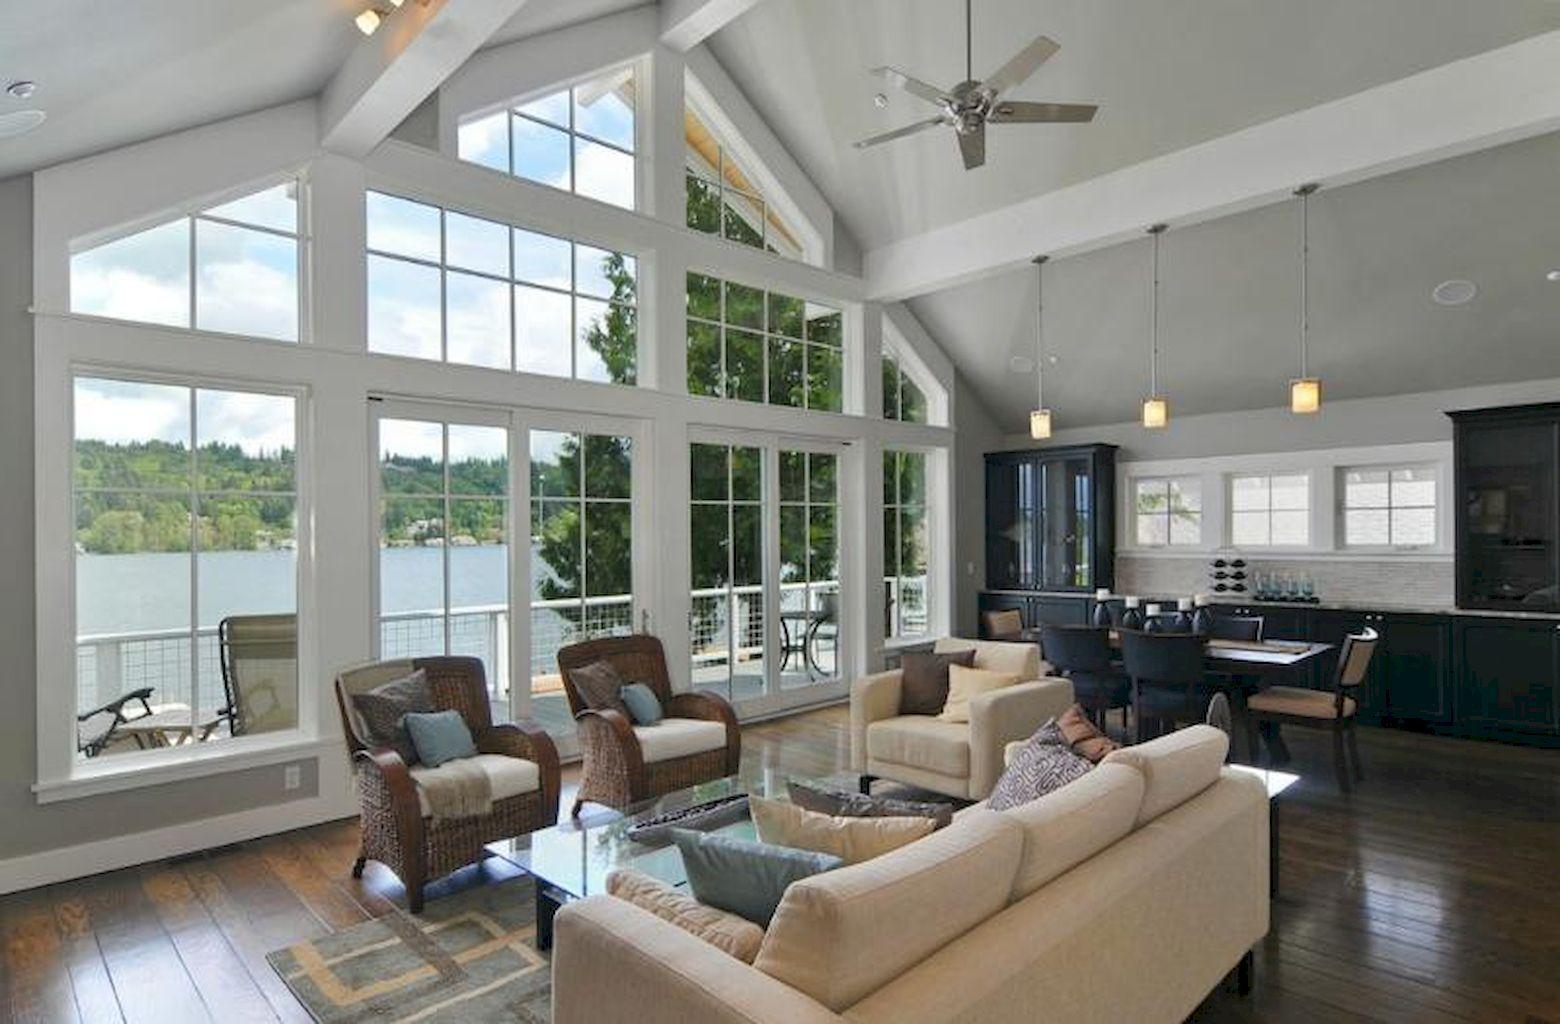 50 Beautiful Lake House Living Room Ideas images